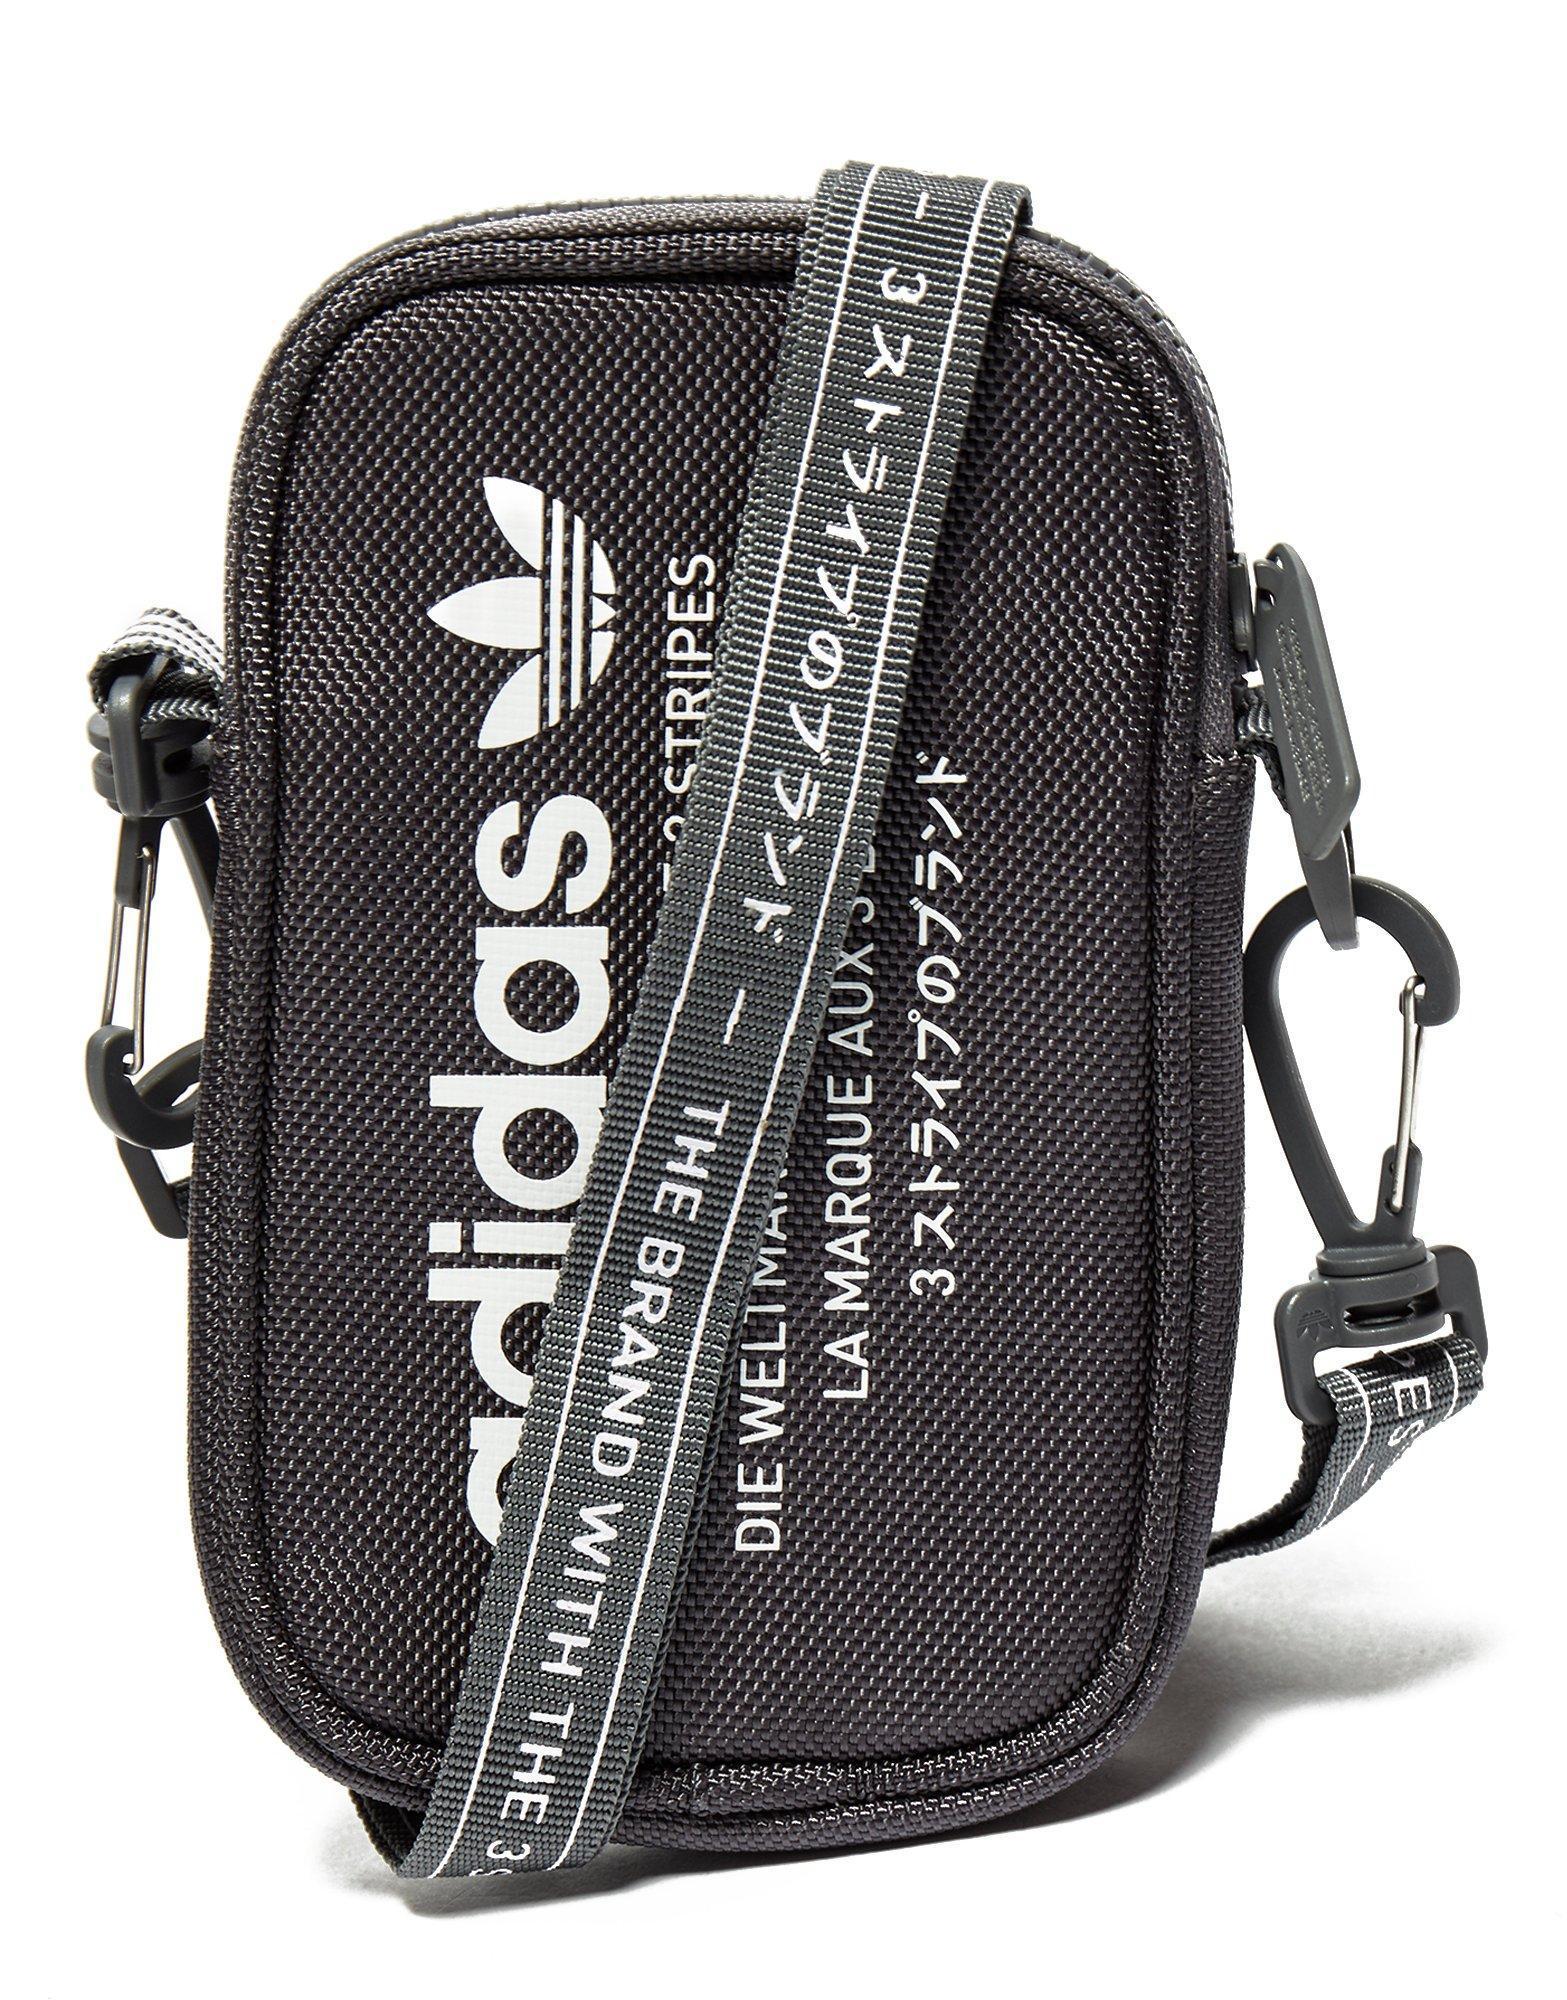 fbc4be32d8a adidas Originals Festival Nmd Bag in Gray for Men - Lyst